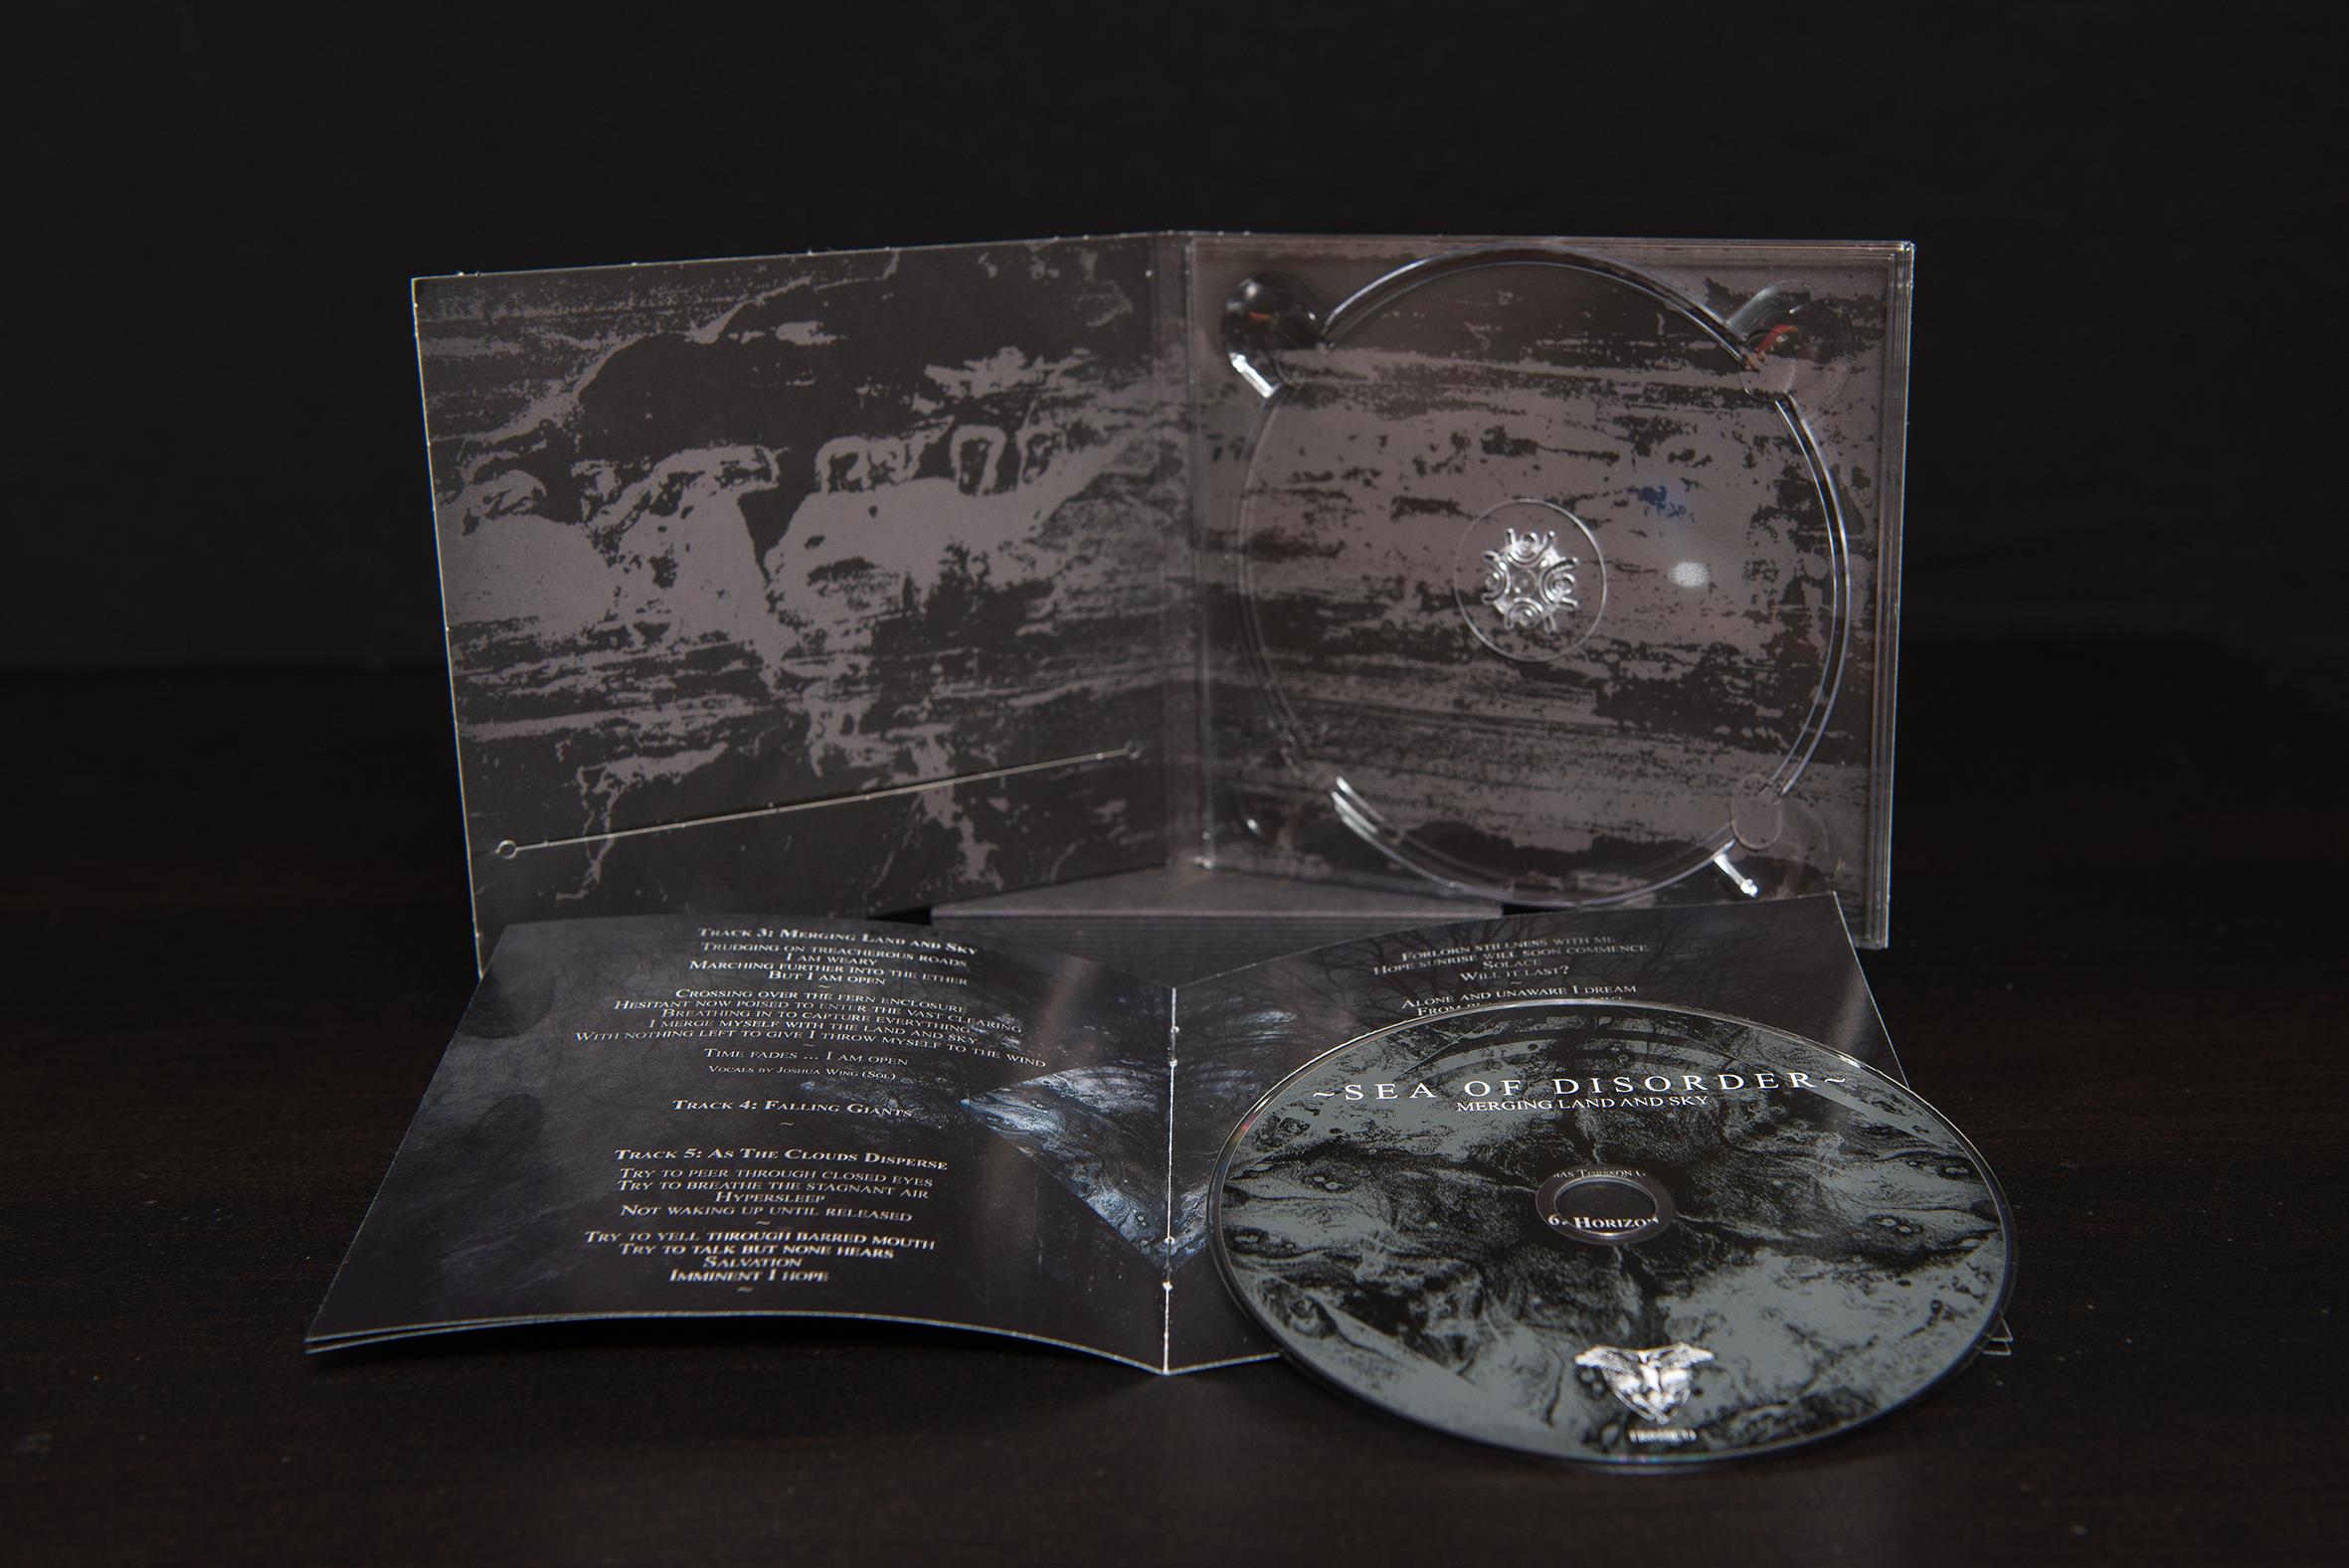 ~Sea Of Disorder~ - Merging Land And Sky CD Digipack